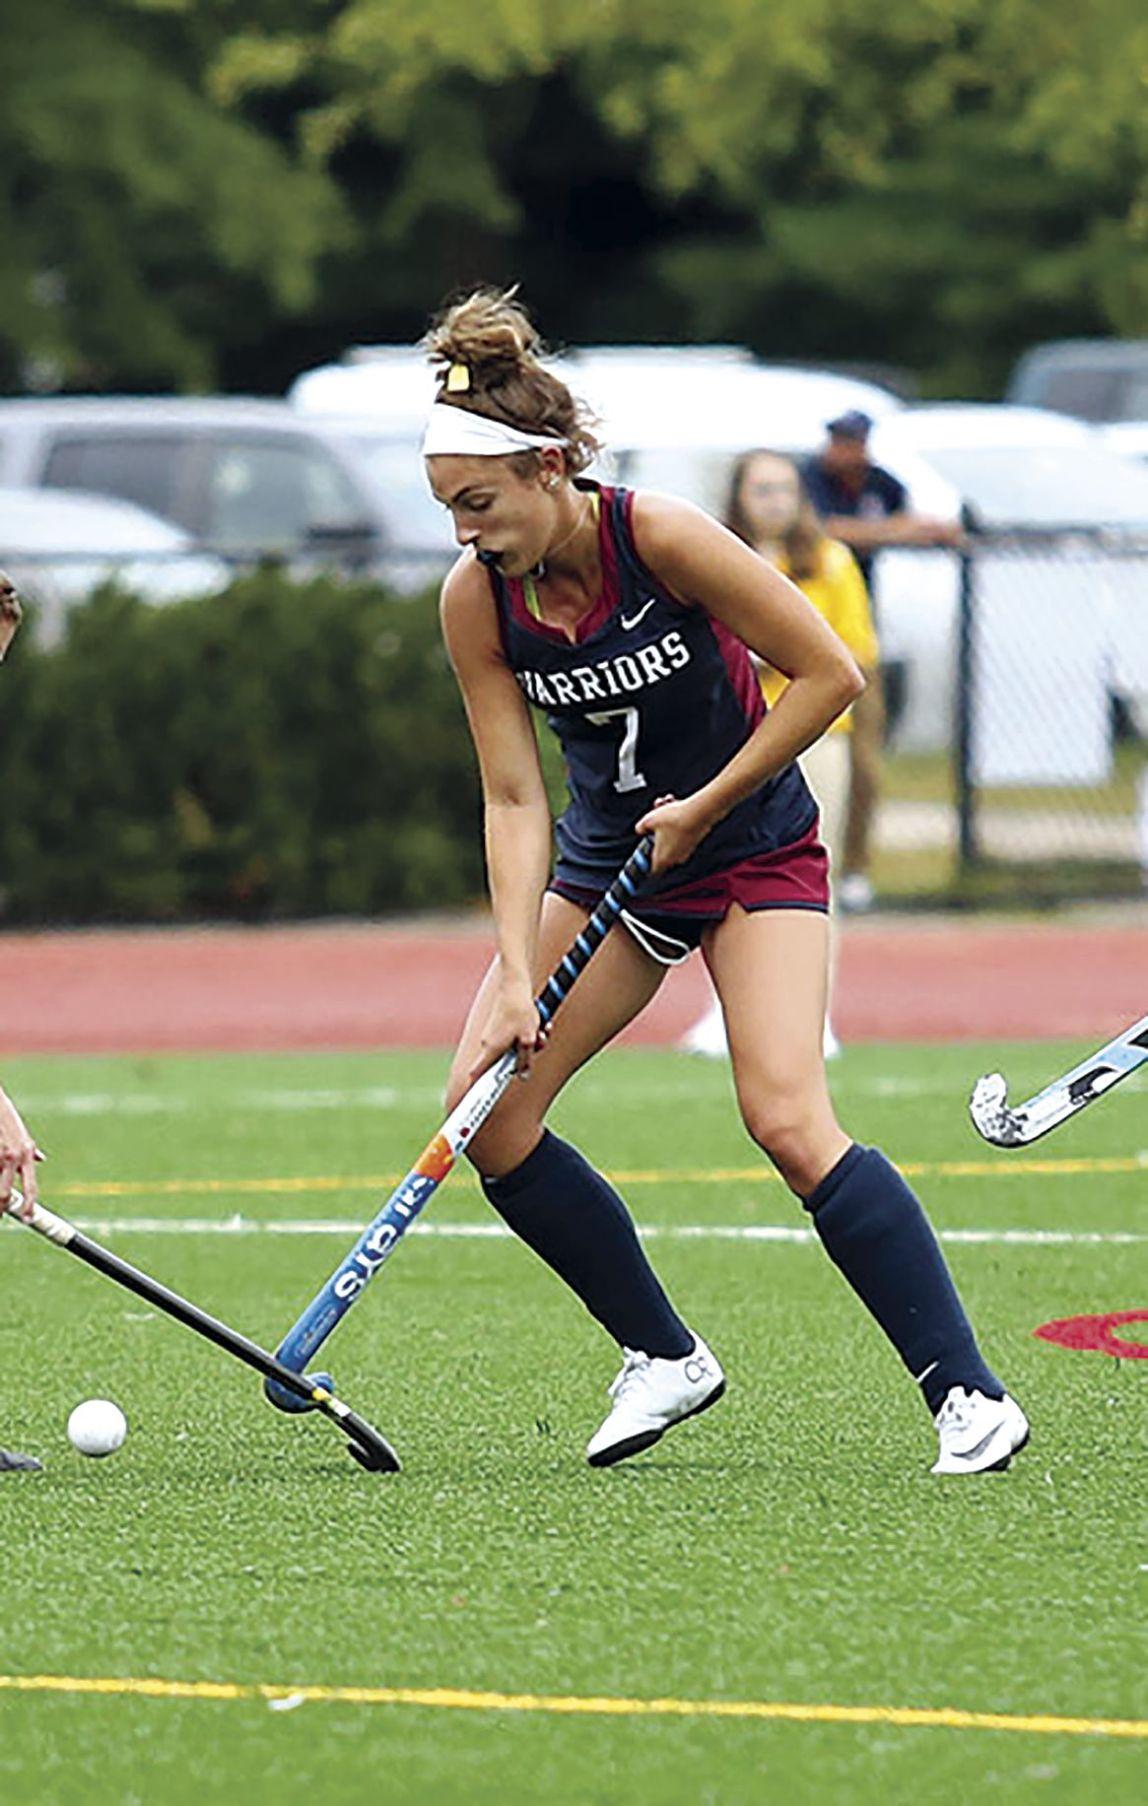 Eastern Connecticut State University Field Hockey Team Throughout Eastern Connecticut State University 2021 2020 Year Calendar